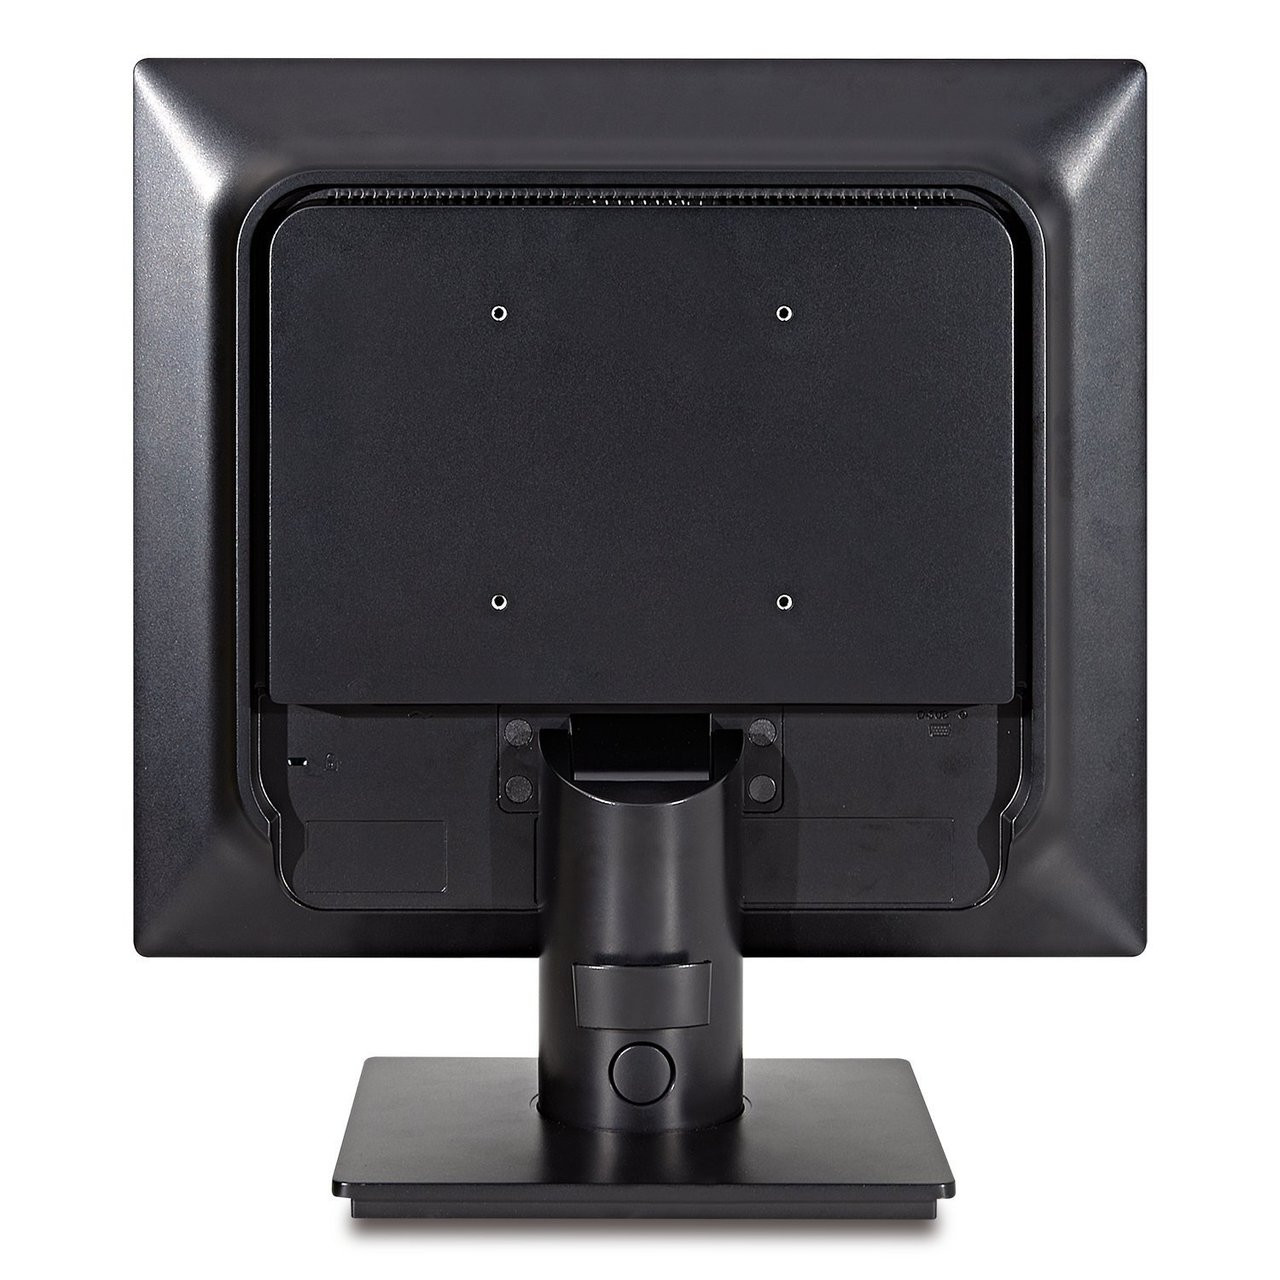 "ViewSonic VA708A-S 17"" LCD Monitor - Refurbished"